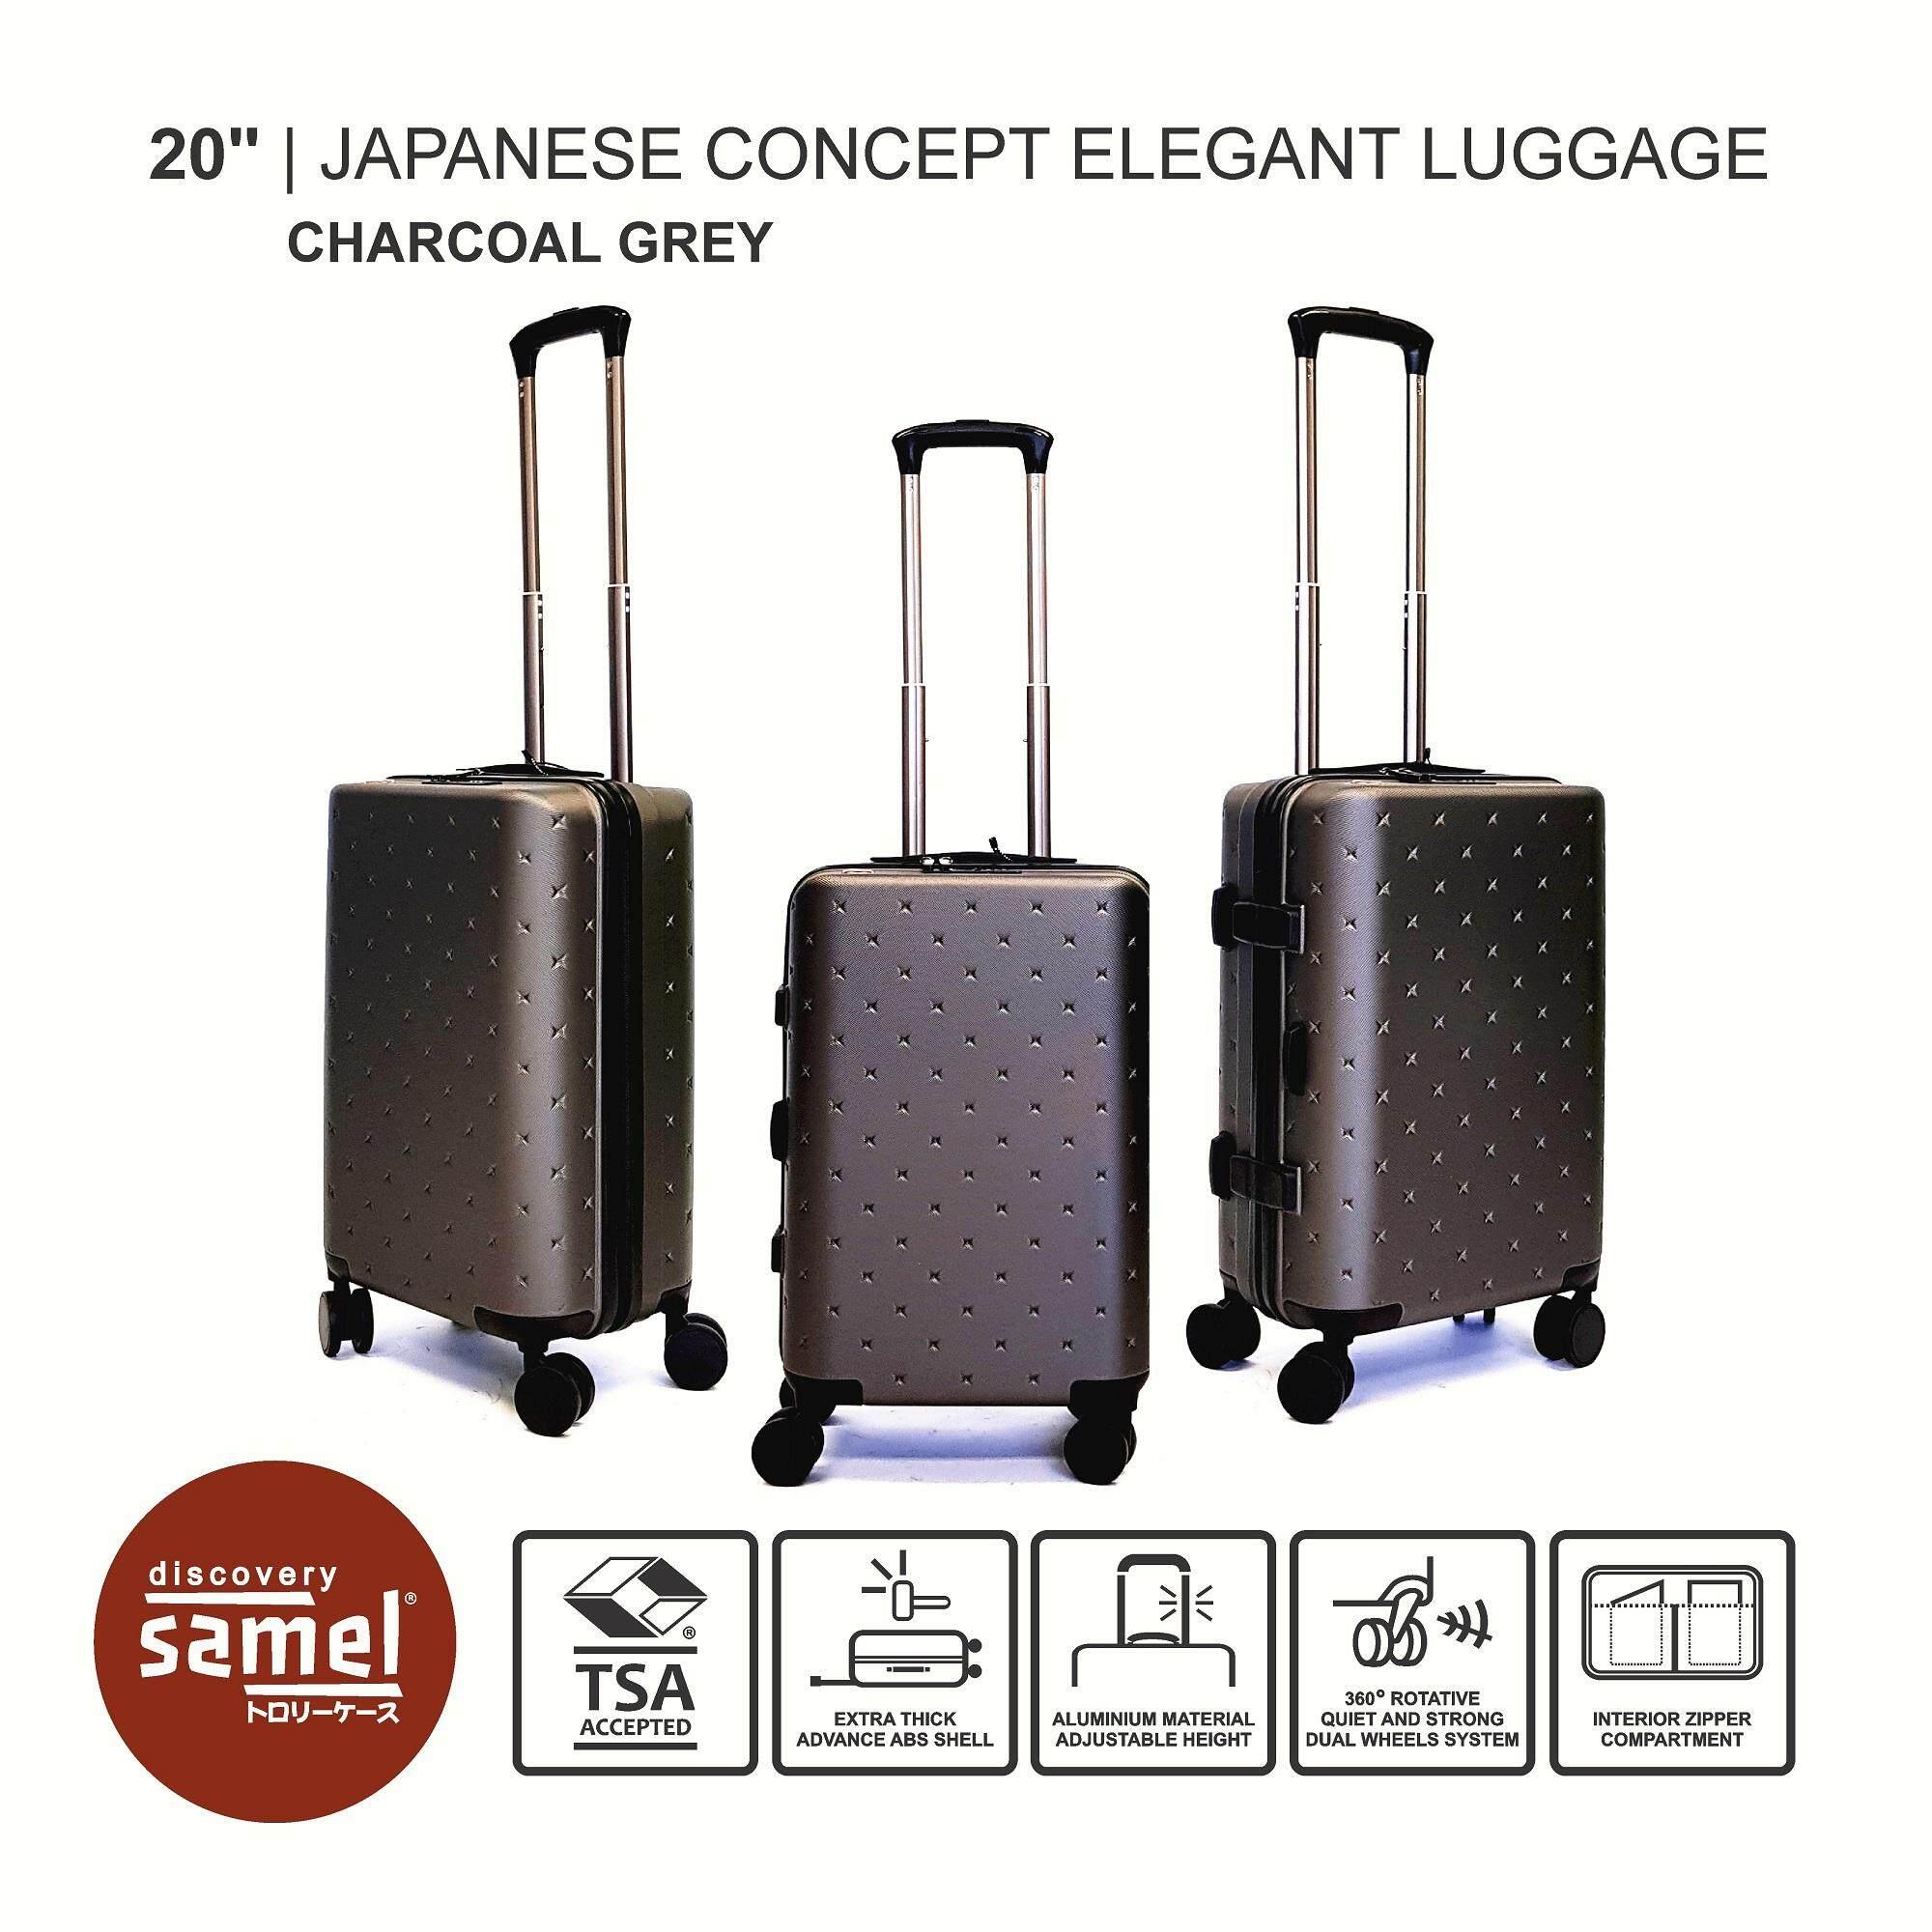 SAMEL FGD 309 JAPANESE CONCEPT ELEGANT 20'' LUGGAGE